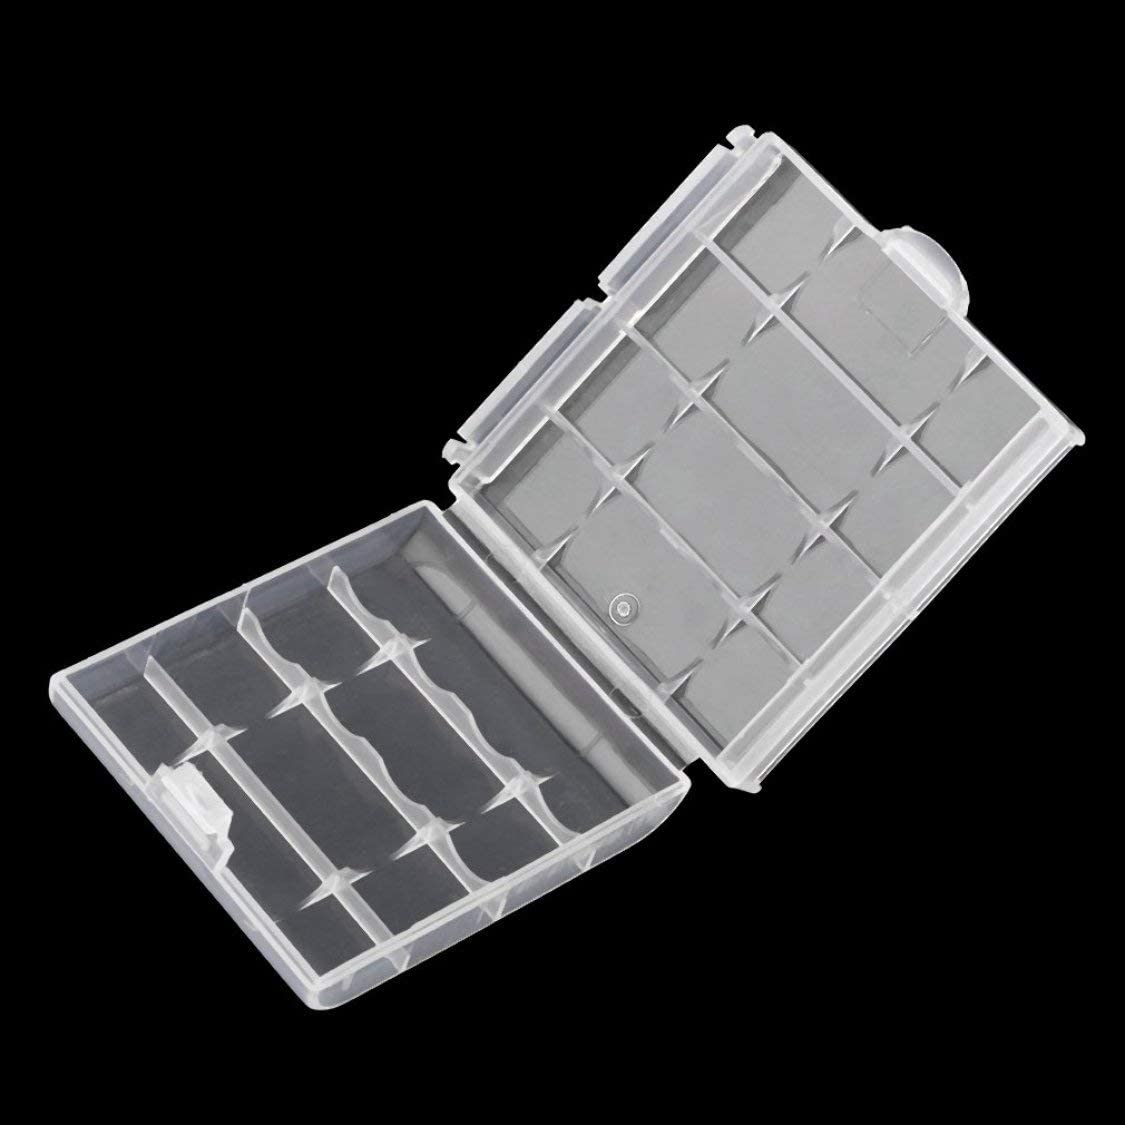 Dynamovolition Langlebige Kunststoffbatterie Aufbewahrungsbox Hartplastikh/ülle f/ür 4 St/ück AA AAA Batterien Tragbare Batteriehalter 6 cm /× 1,5 cm /× 6 cm